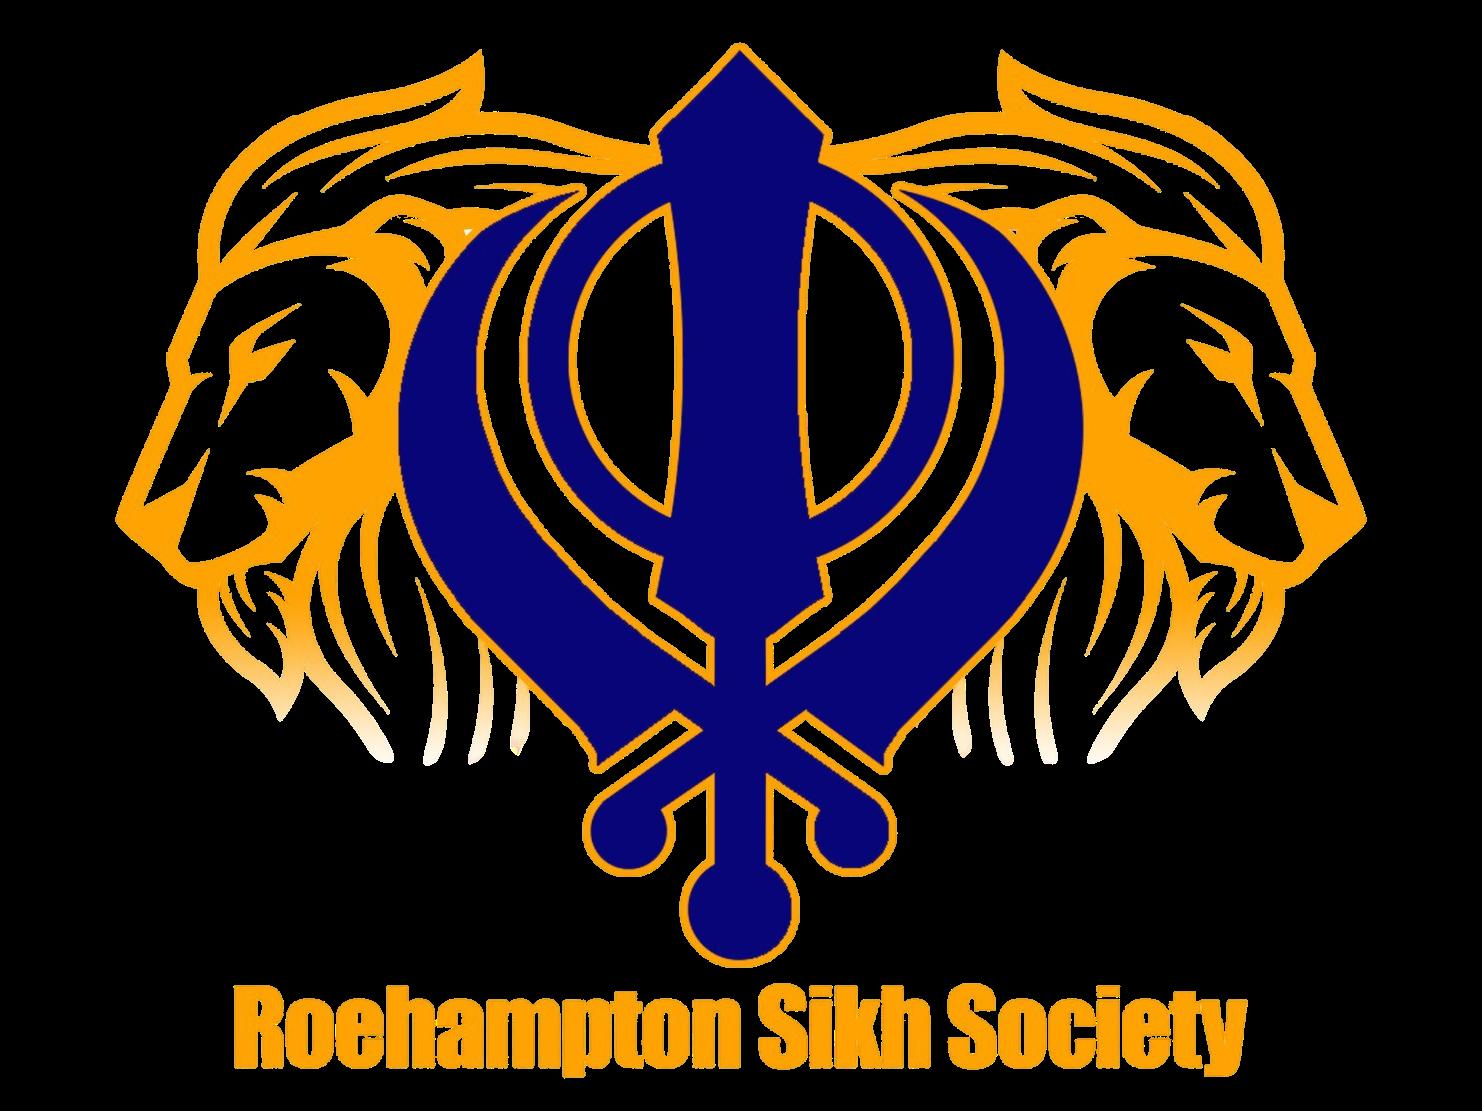 Roehampton Sikh Society